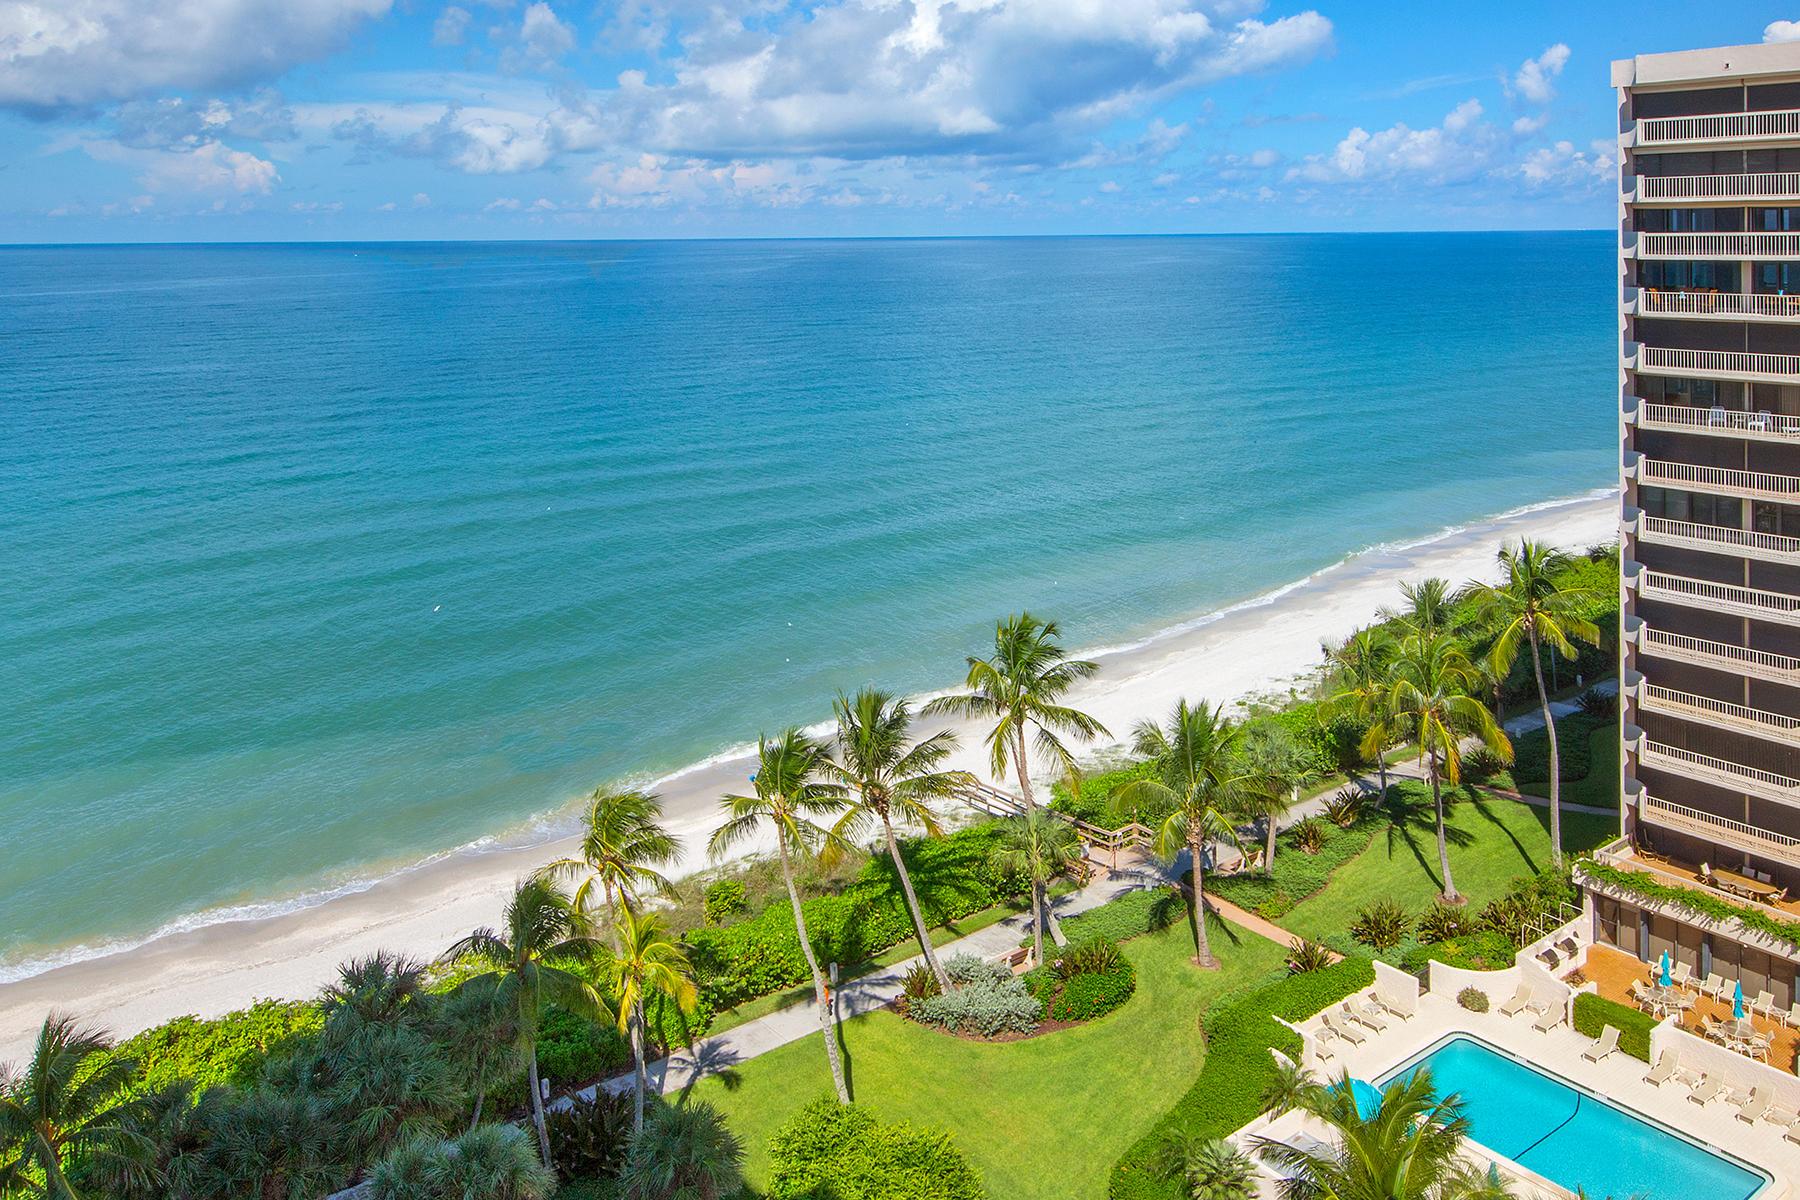 共管物業 為 出售 在 PARK SHORE - SURFSEDGE 4001 Gulf Shore Blvd N 1202 Naples, 佛羅里達州, 34103 美國